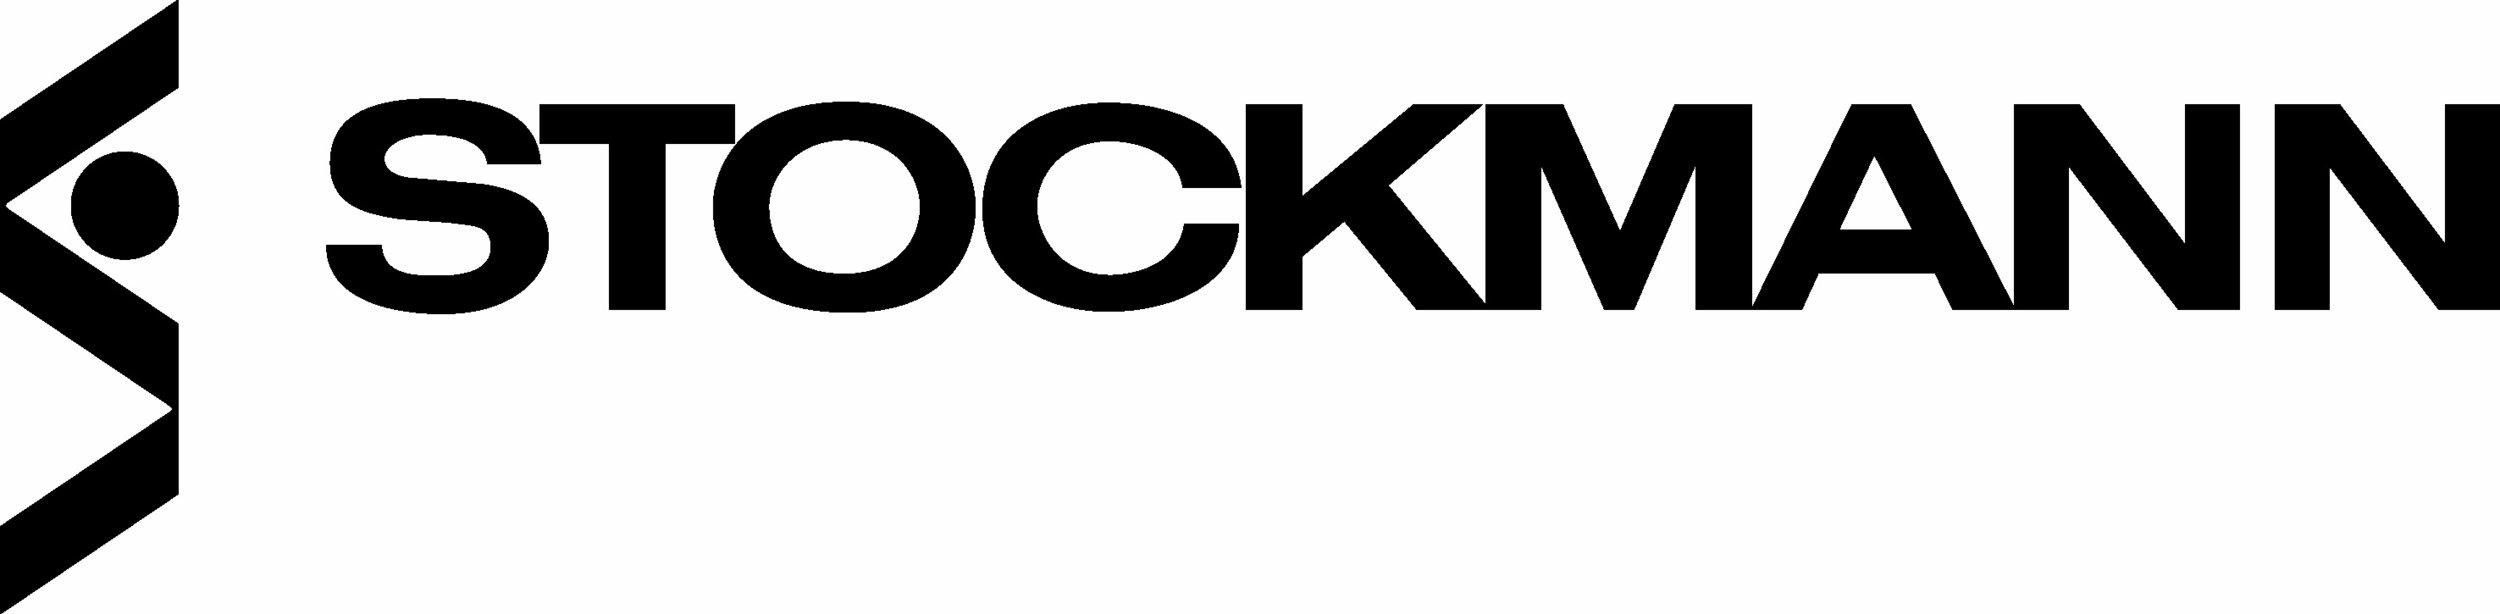 Stockmann logo bw.jpg